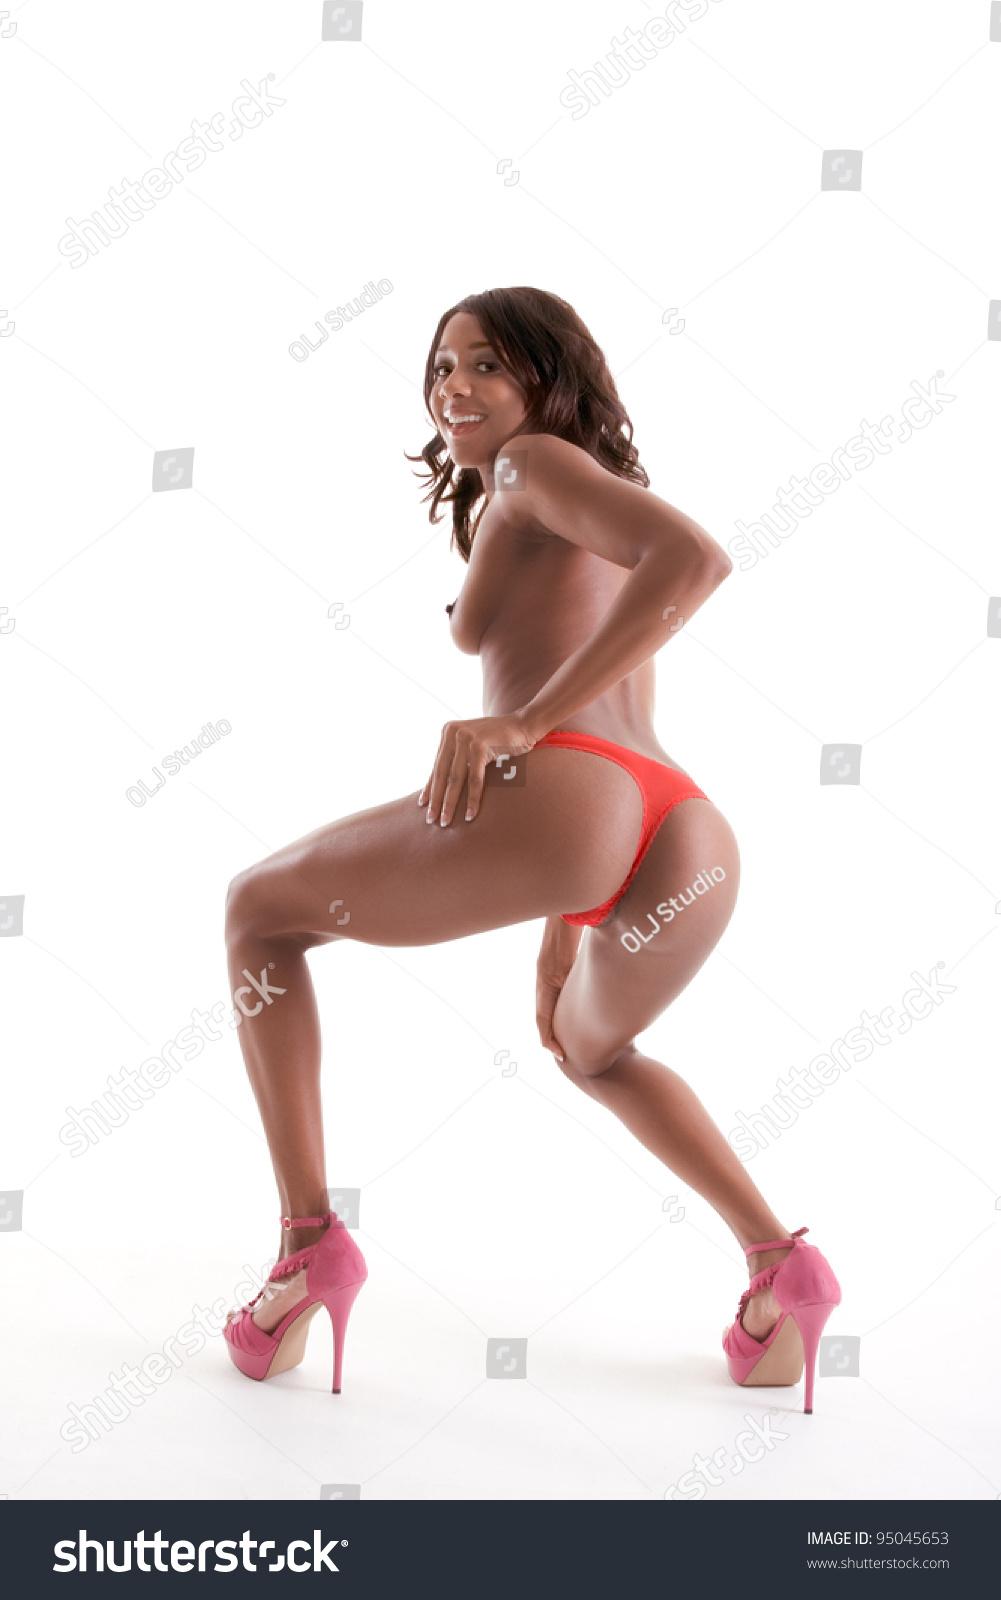 girls nude licking vagina